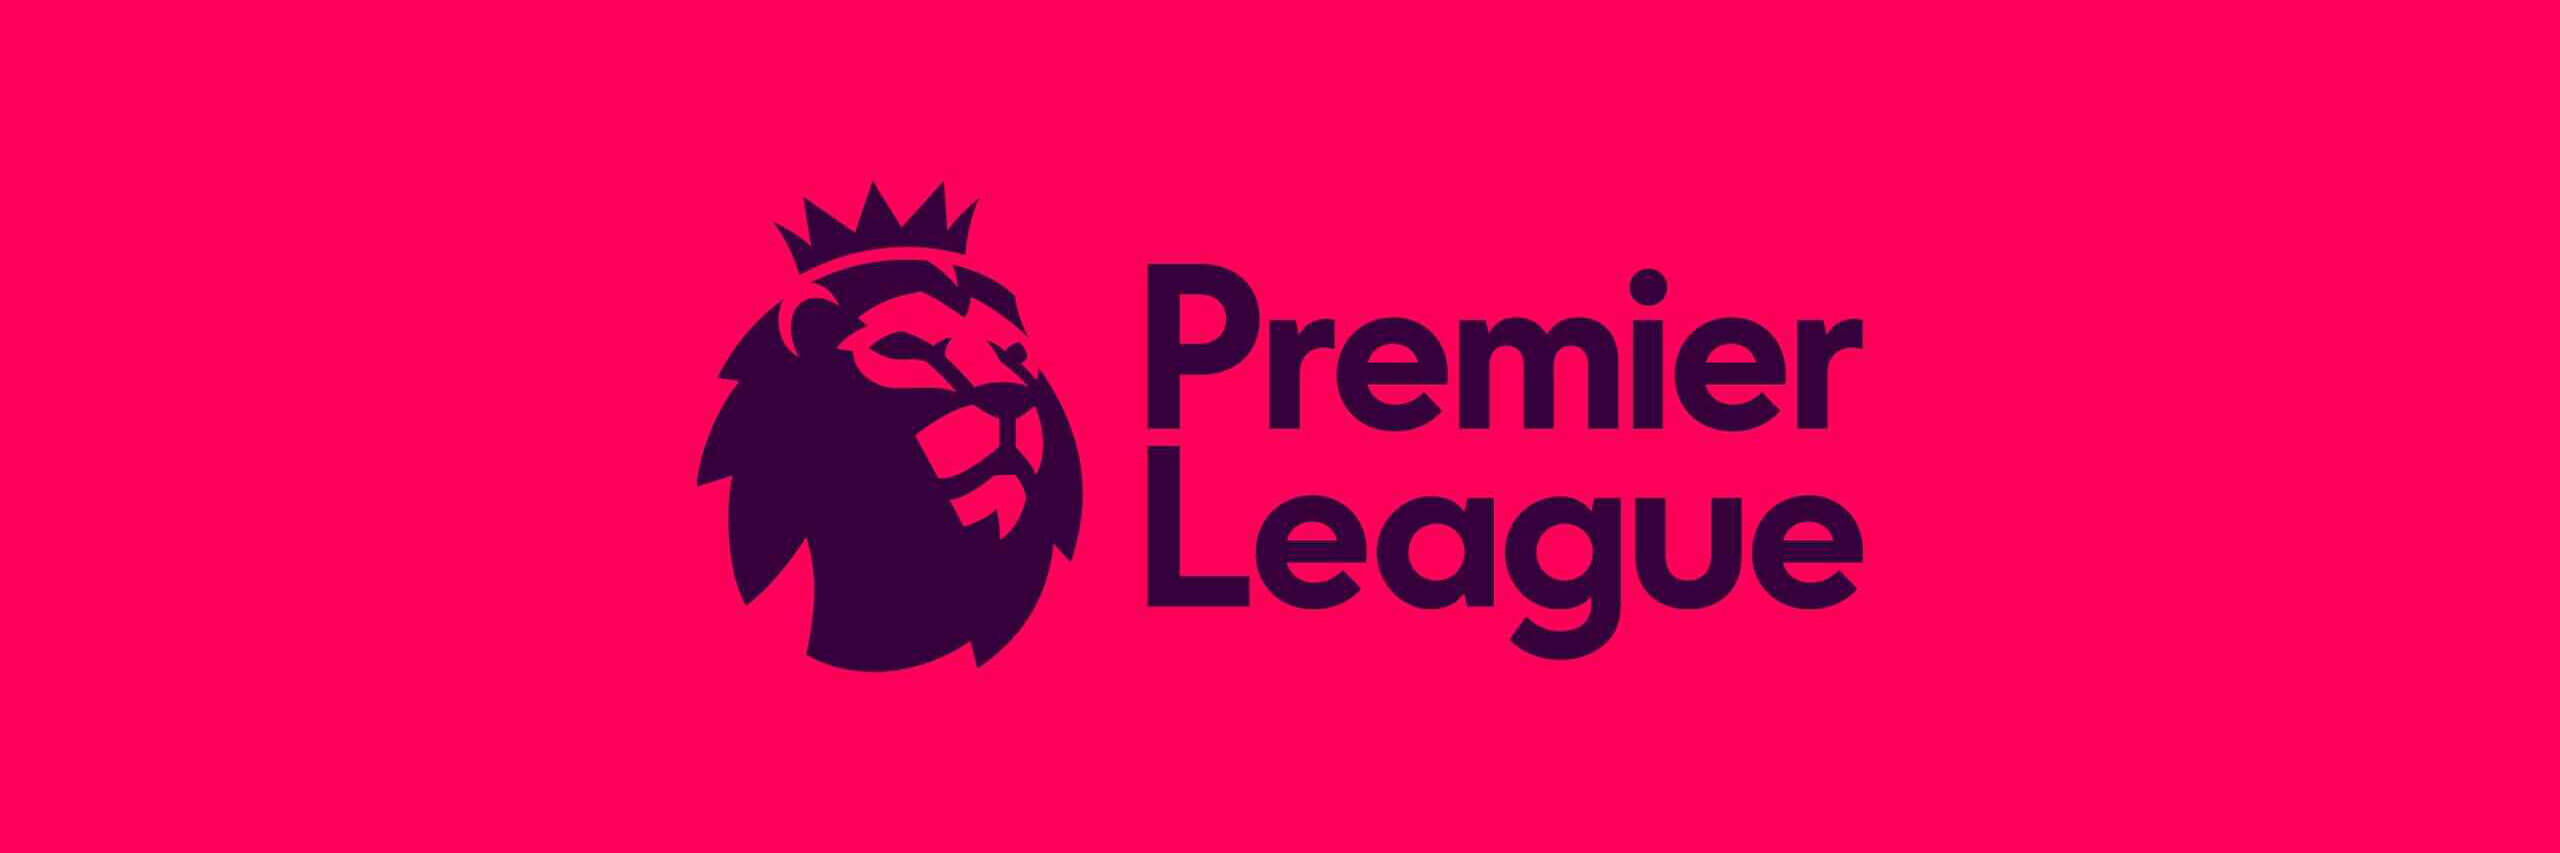 Soccer Premier League COVID-19 Status & Return Date